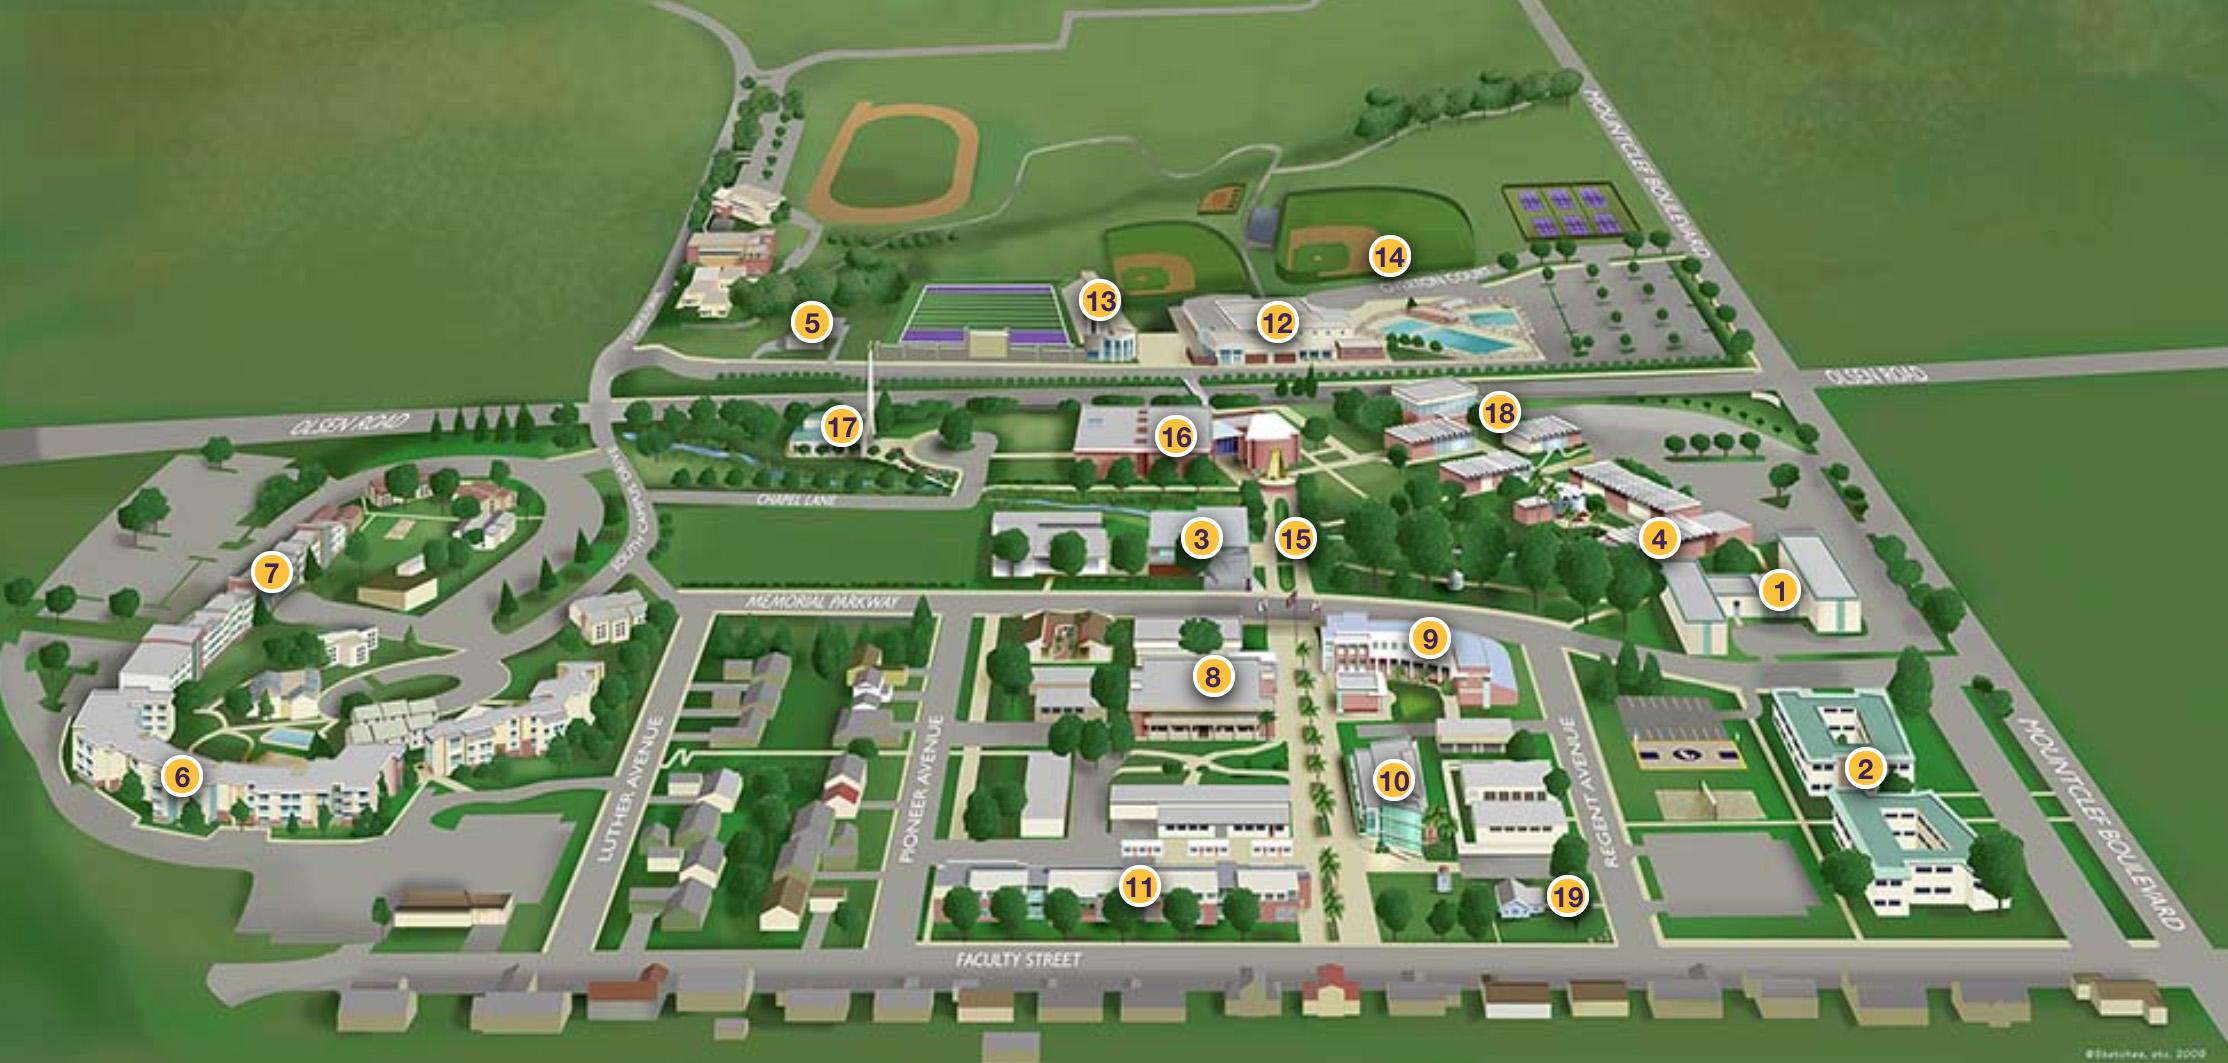 cal lutheran campus map Experience Cal Lutheran Cal Lutheran cal lutheran campus map